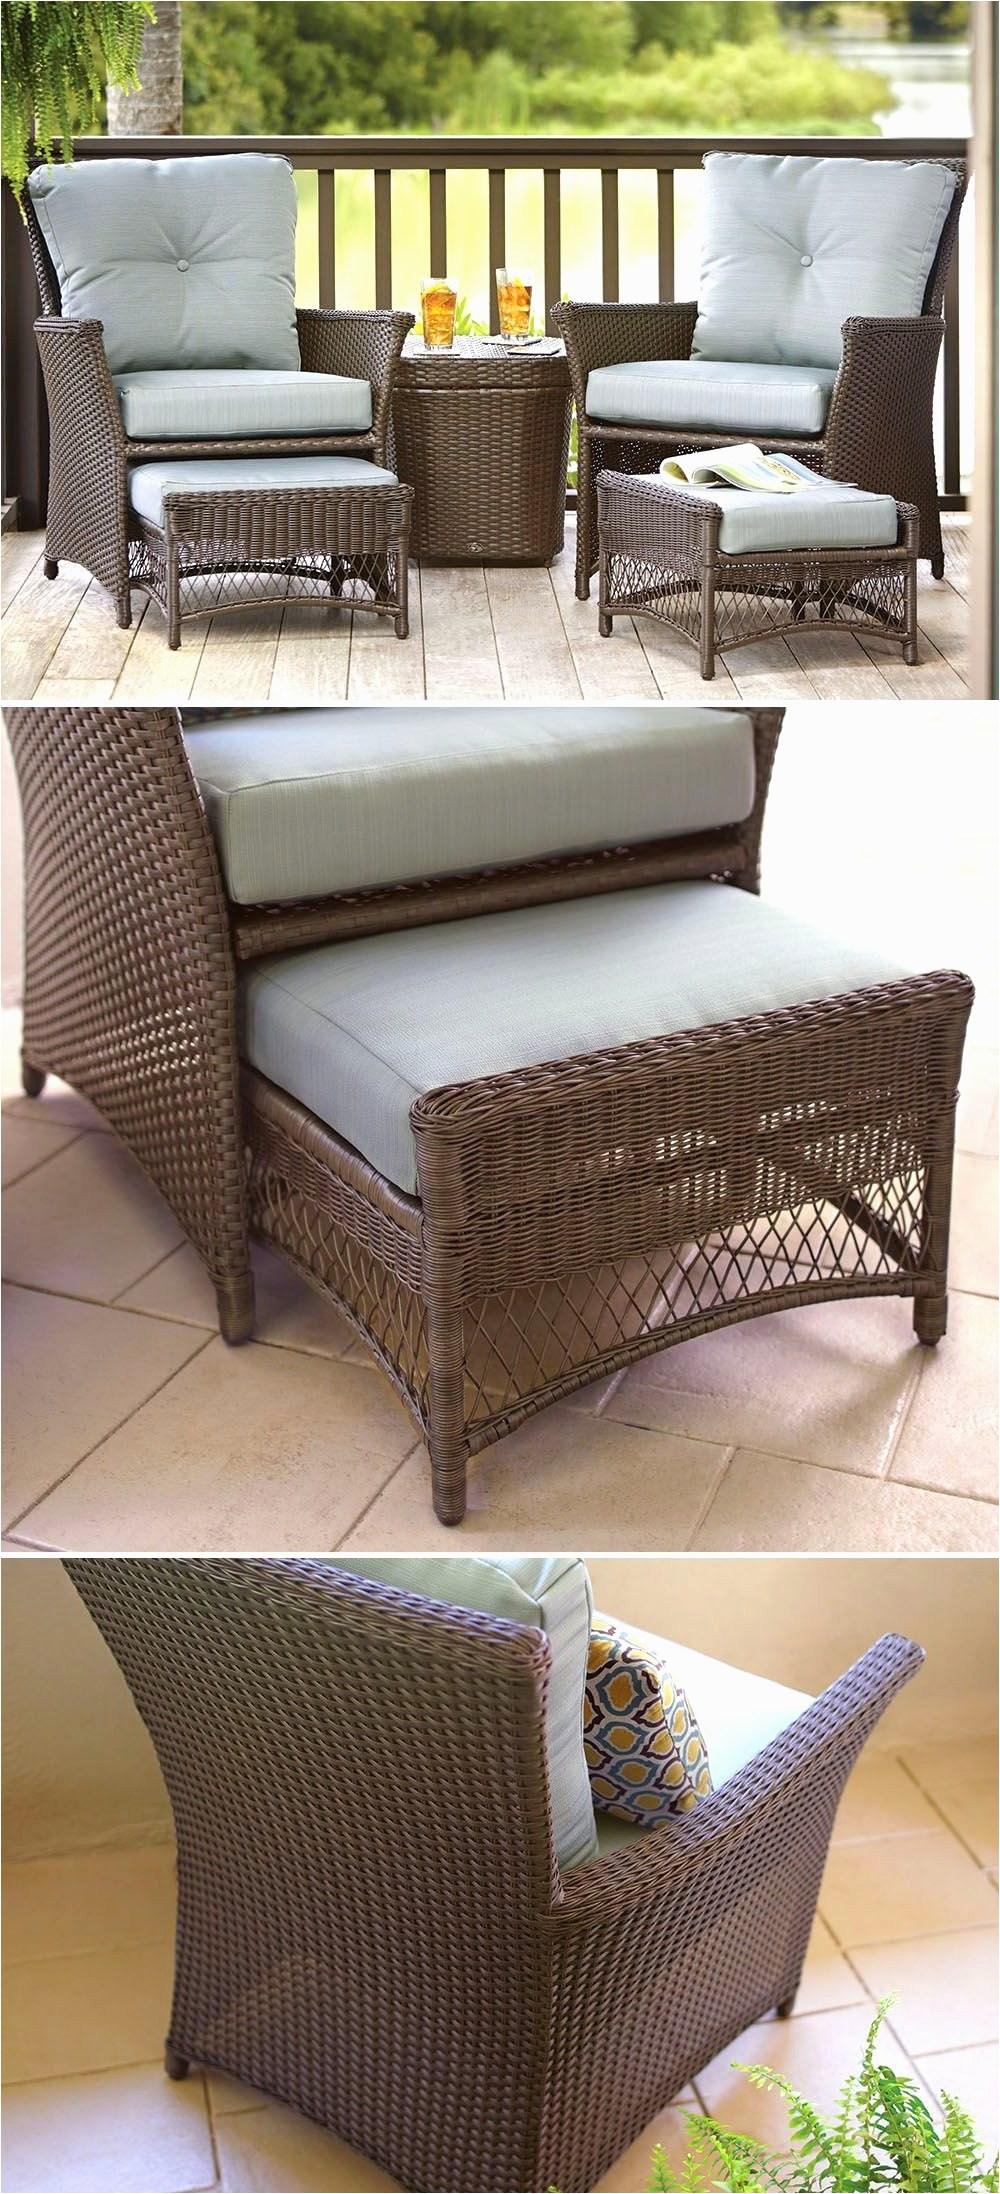 patio furniture cushion storage new wicker outdoor sofa 0d patio from outdoor furniture des moines source